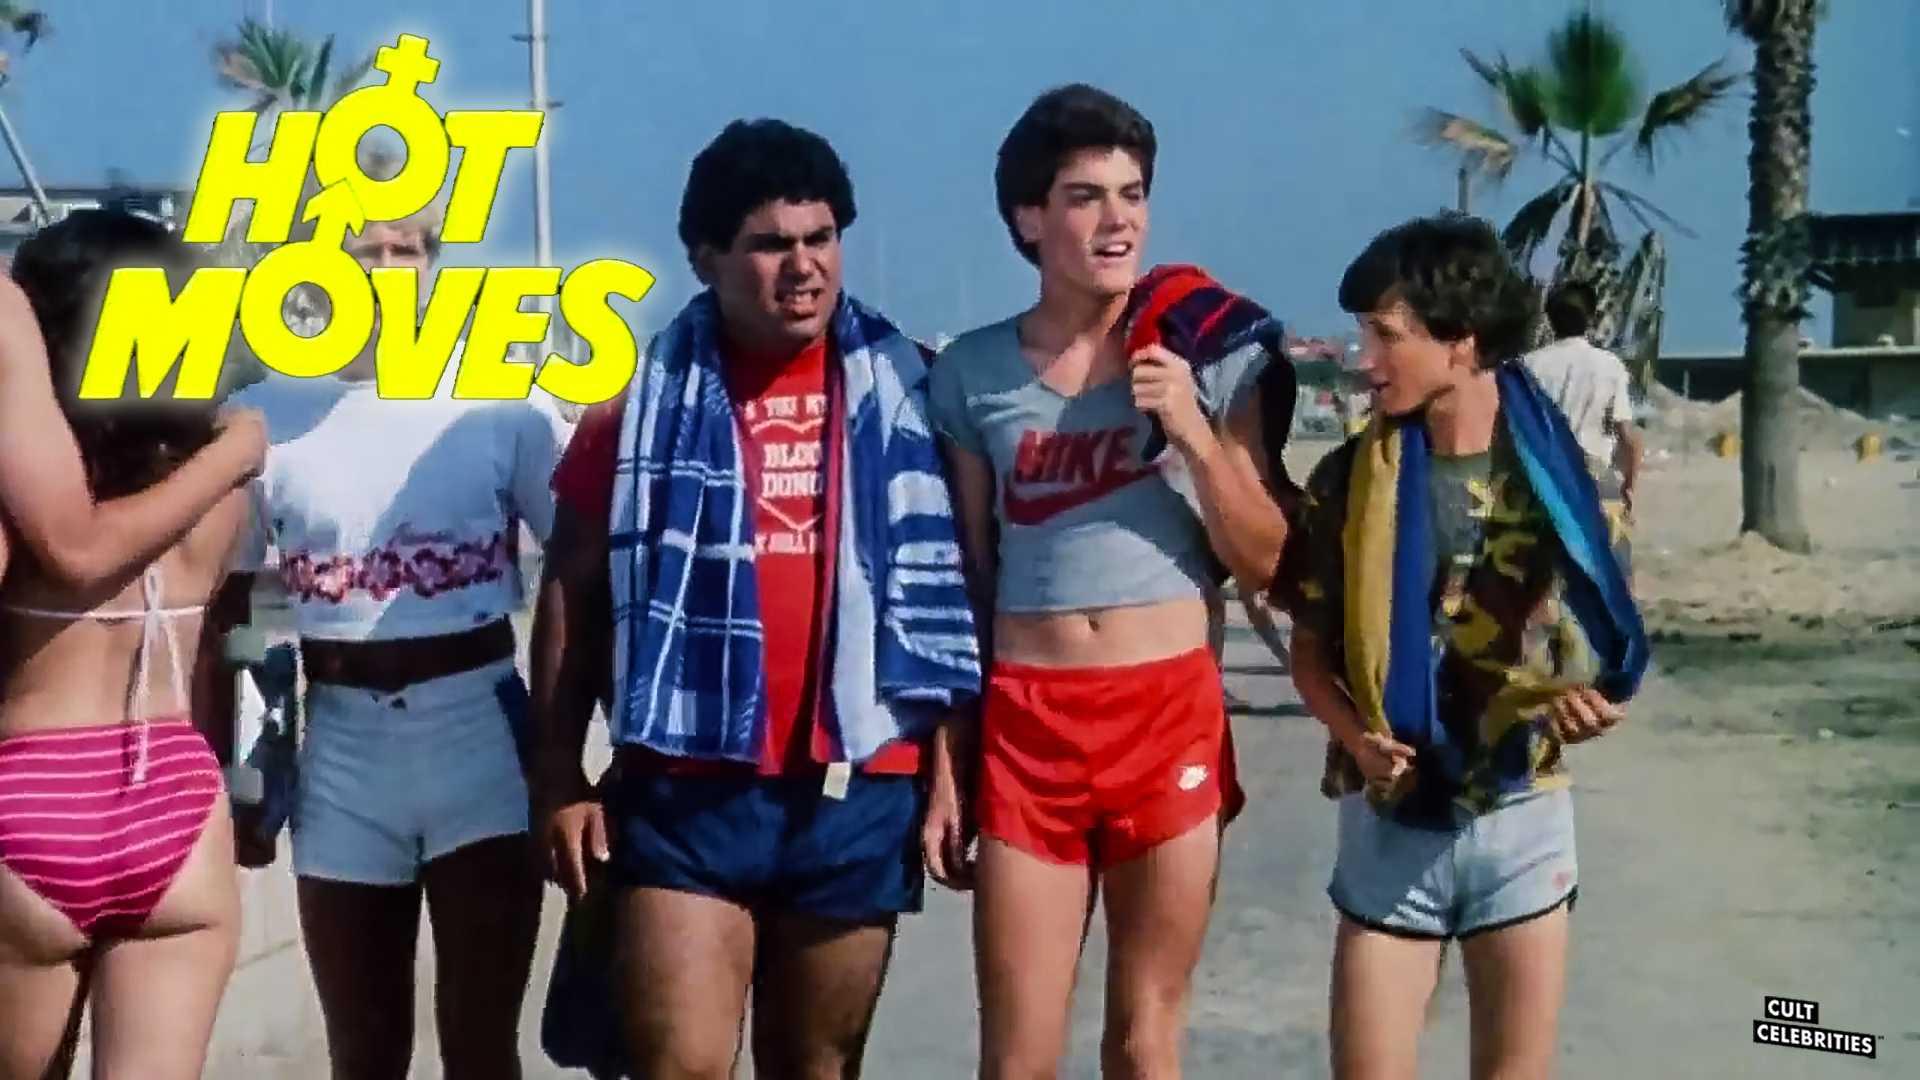 Jeff Fishman, Adam Silbar, Johnny Timko, and Michael Zorek in Hot Moves (1984)